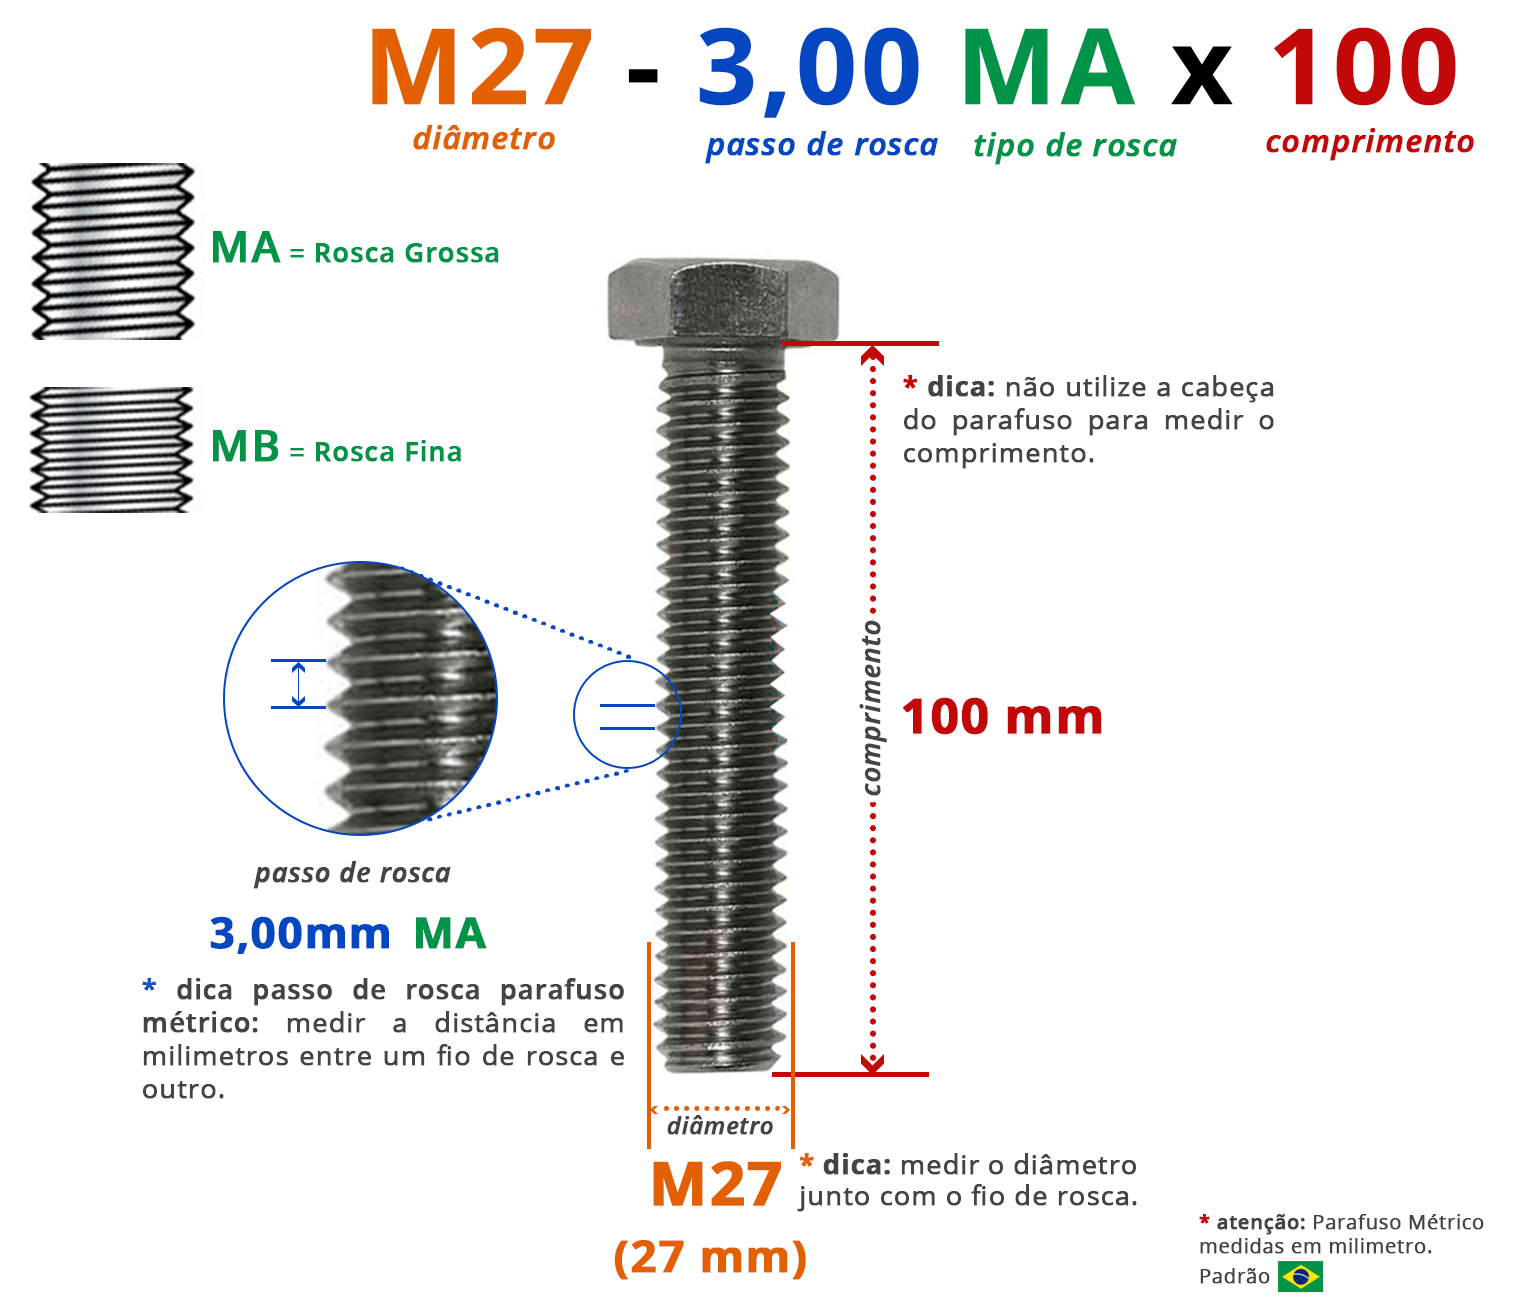 PARAFUSO SEXTAVADO ROSCA INTEIRA M27 3,00 MA X 100 DIN 933 INOX A4